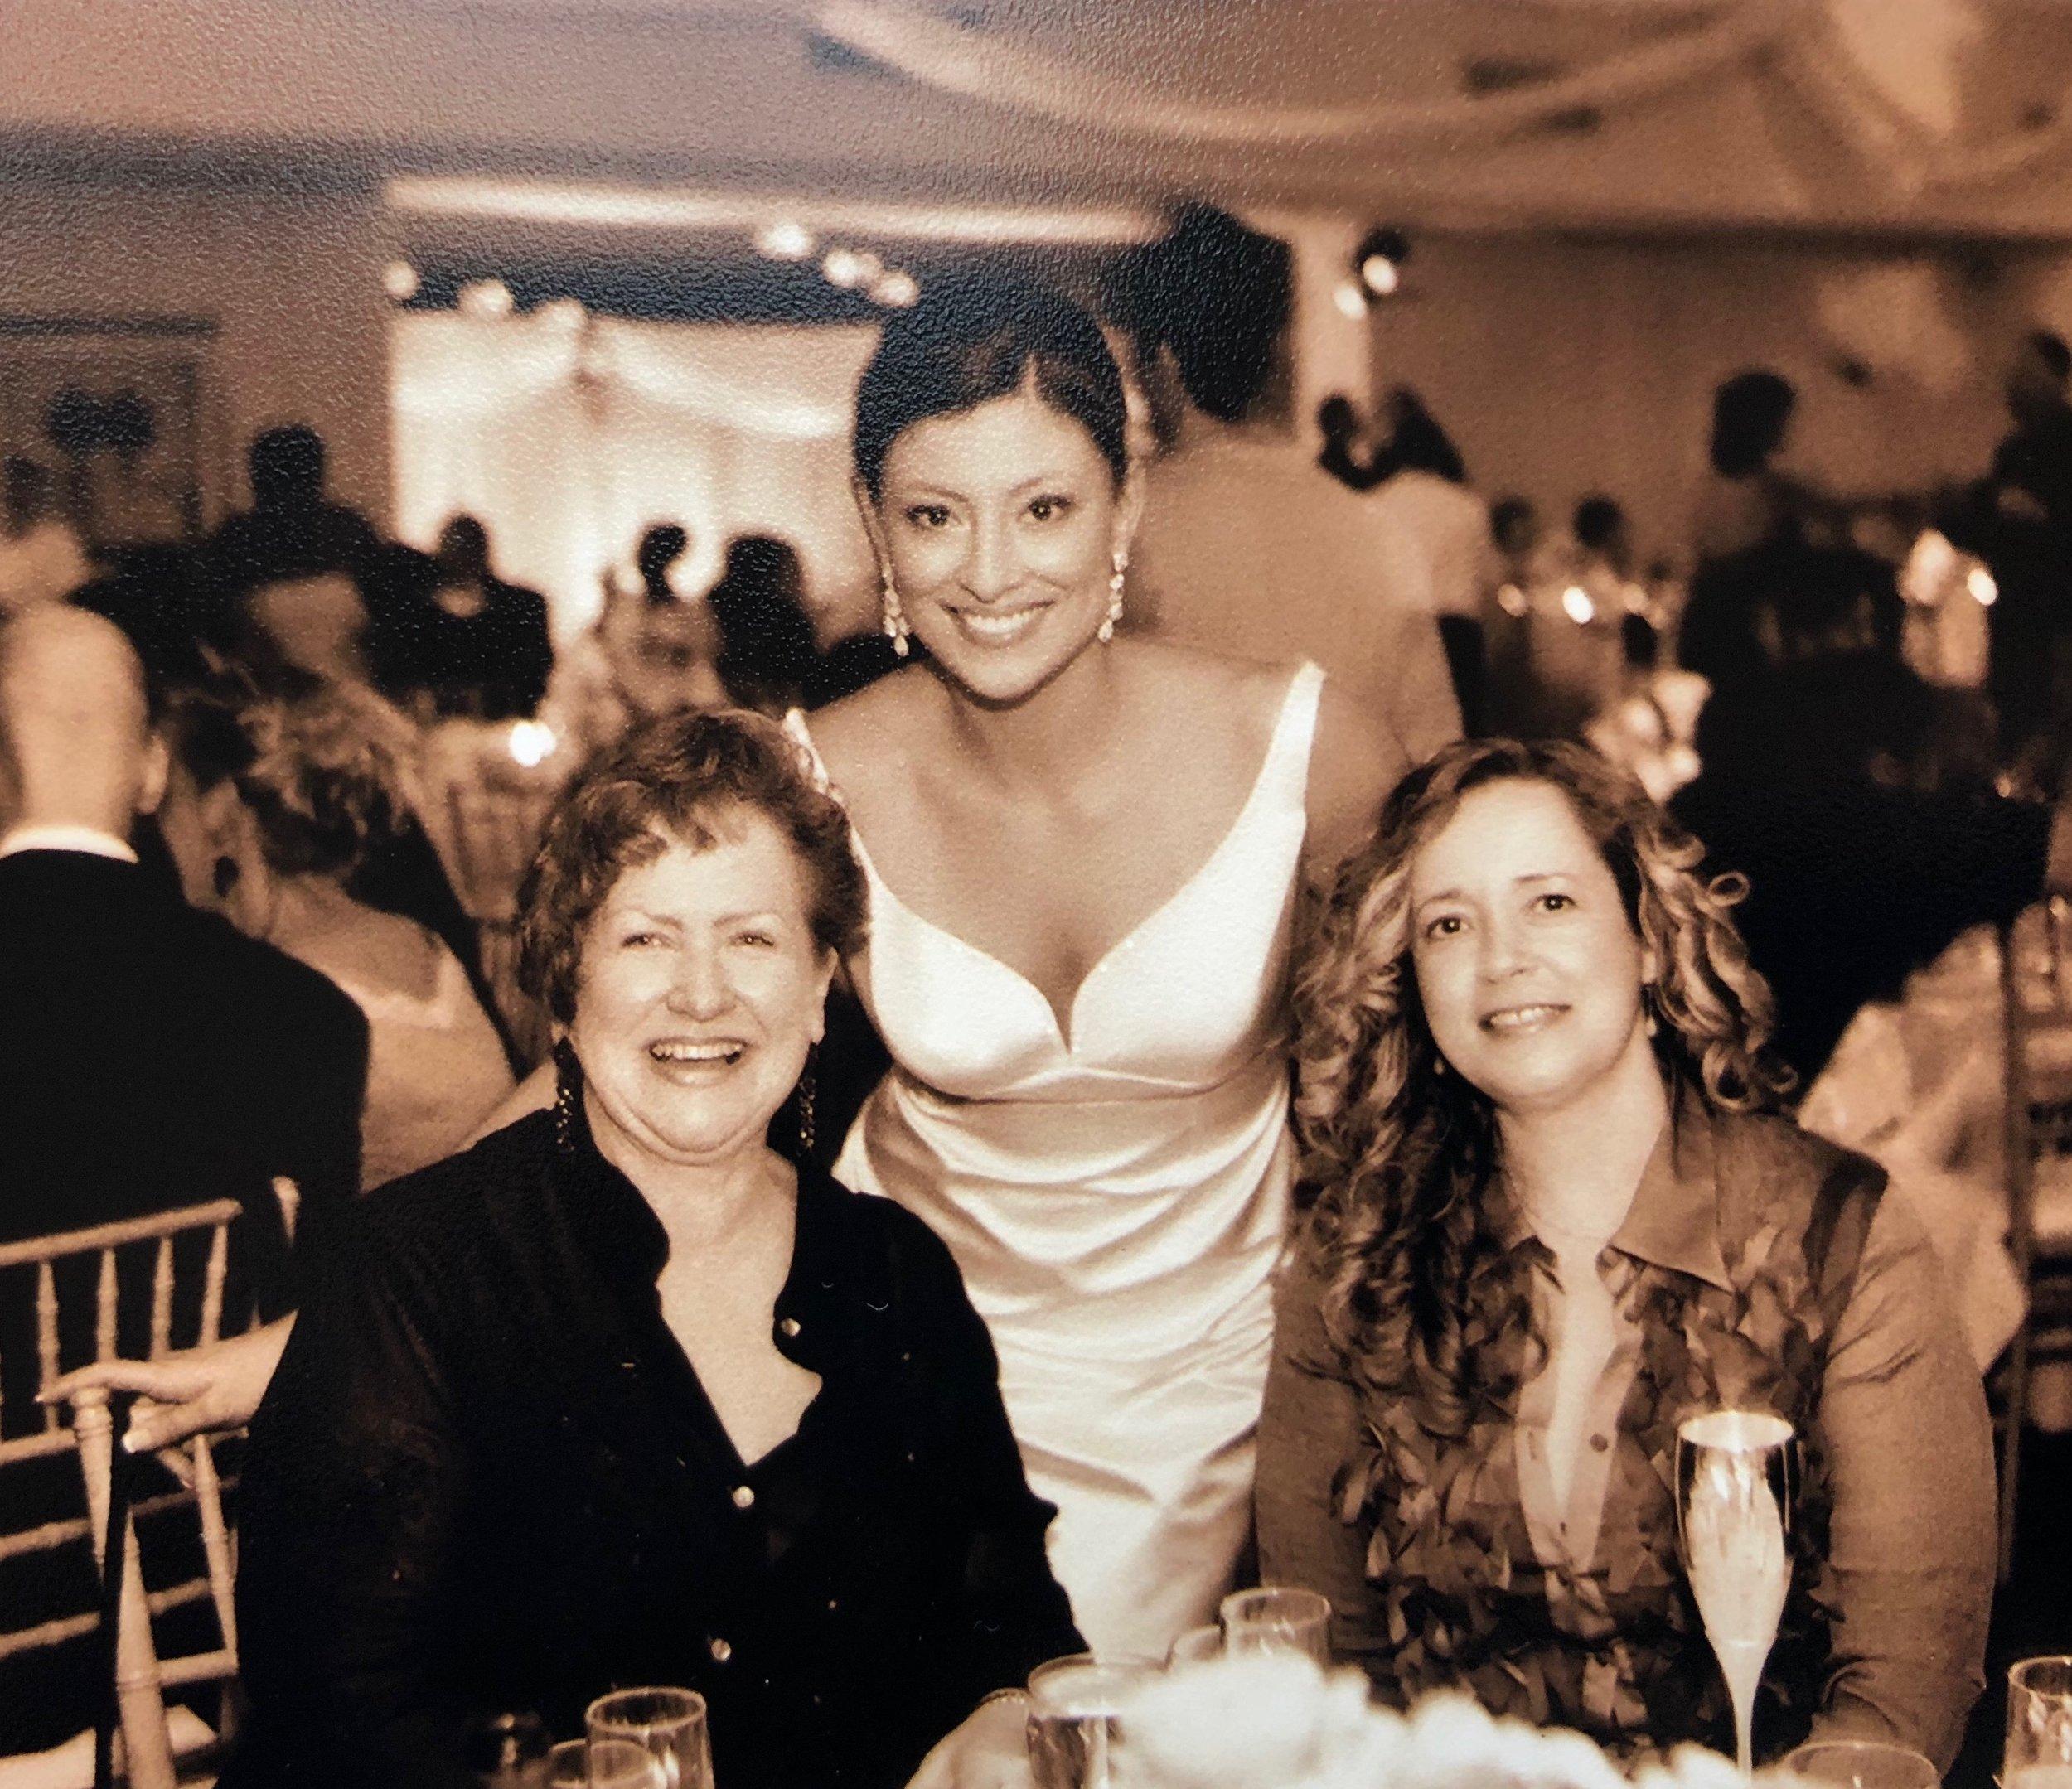 Diana Guevara's wedding, April 2005, with Maria Navarro